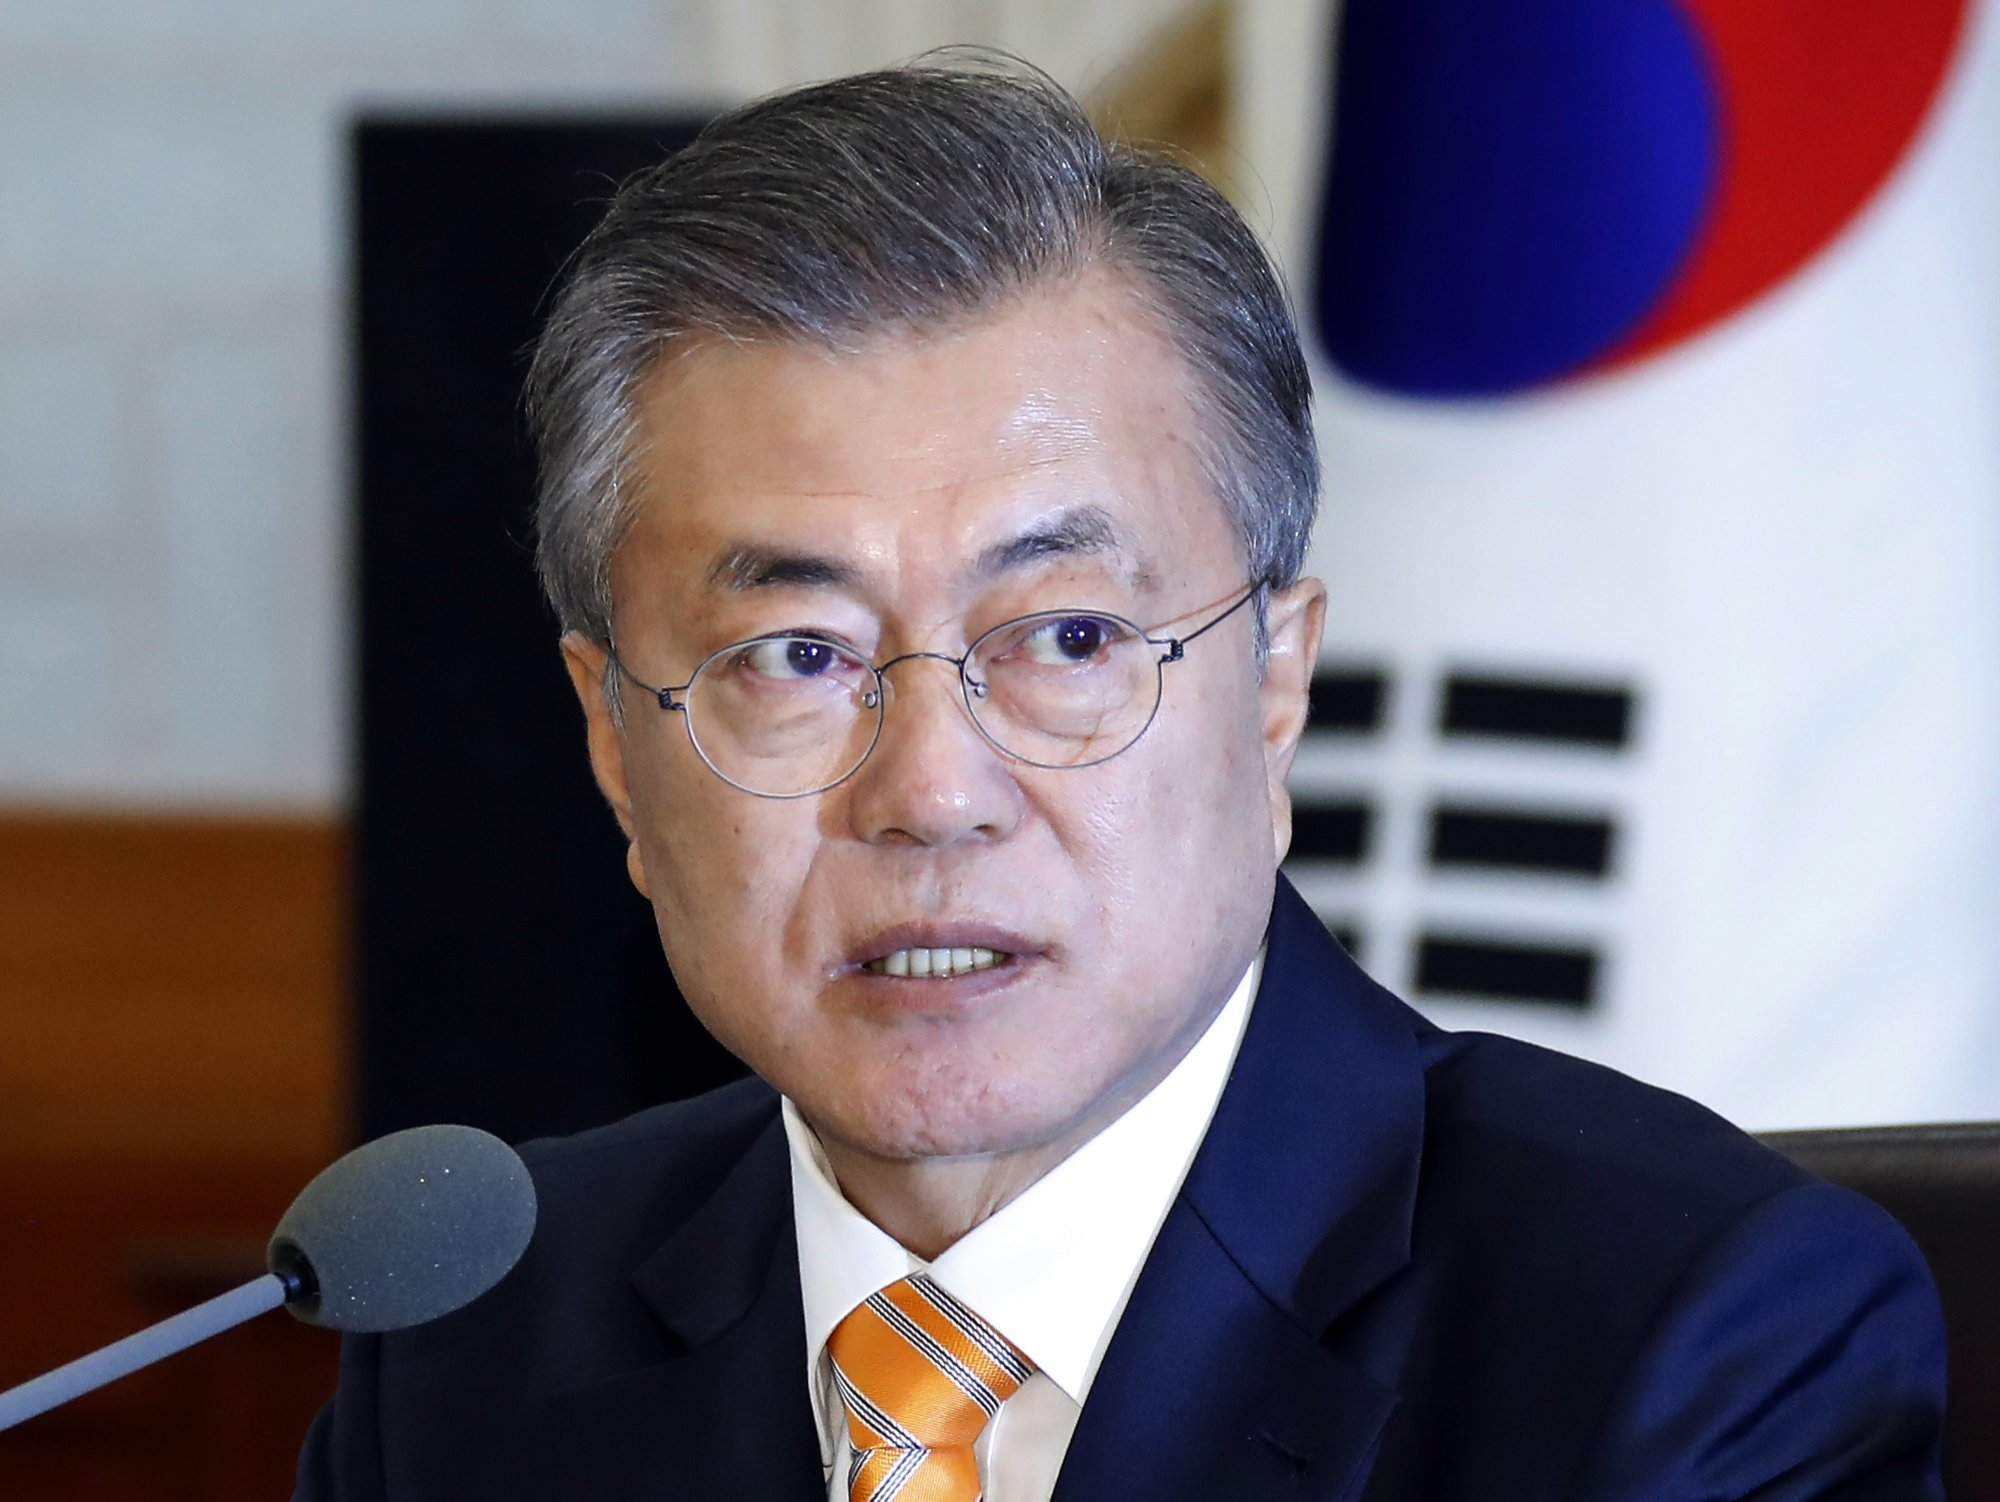 South Korea's Moon ratifies deals with Kim despite backlash